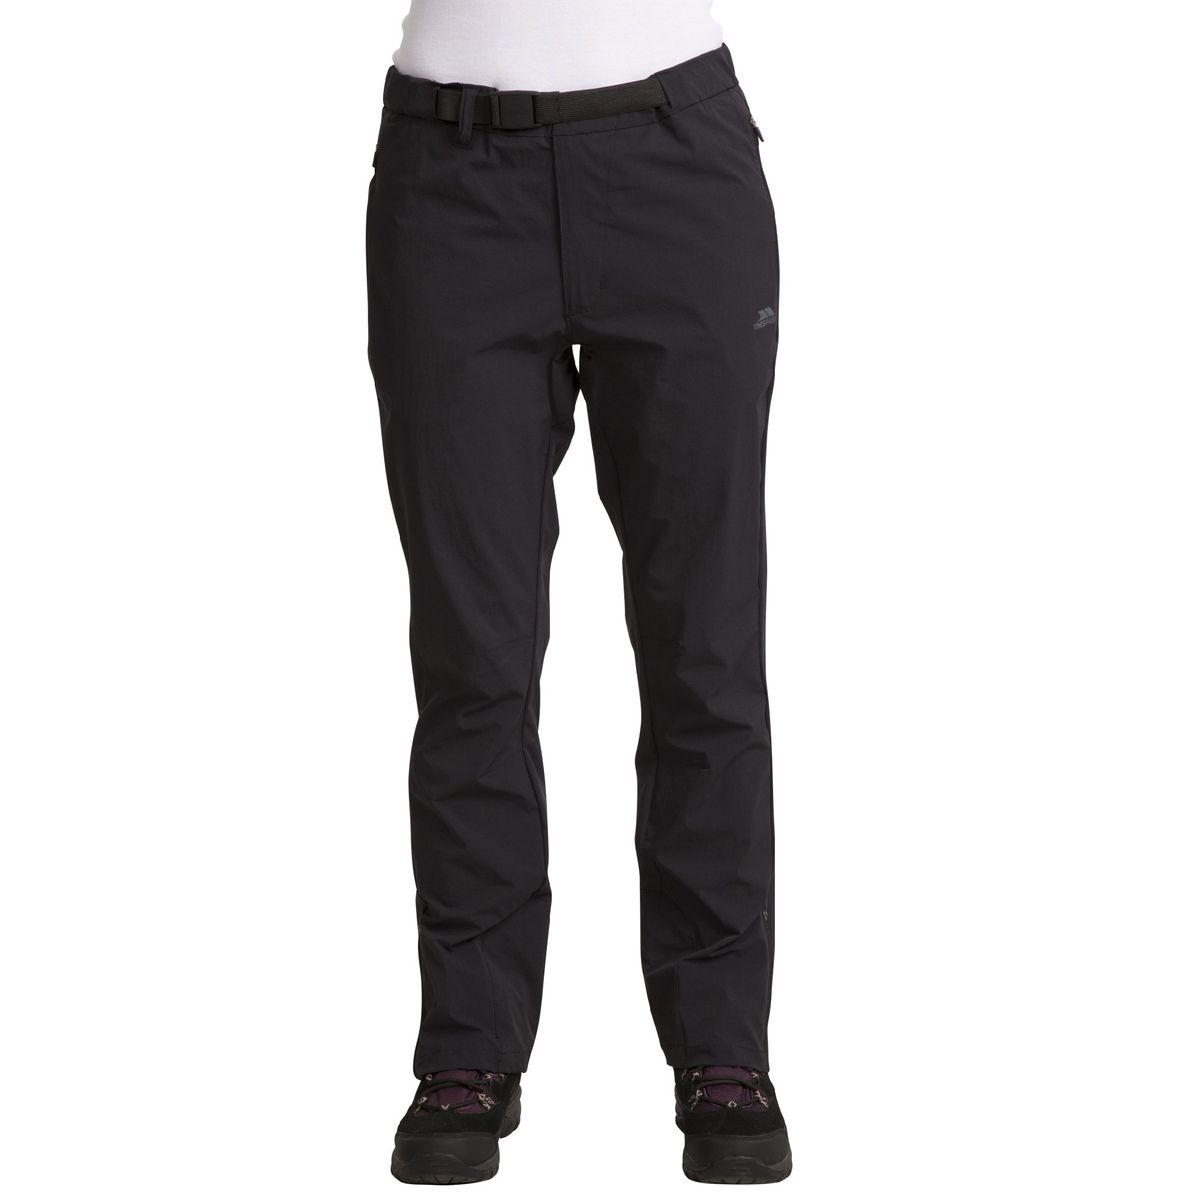 Pantalon de randonnée STORMLIGHT